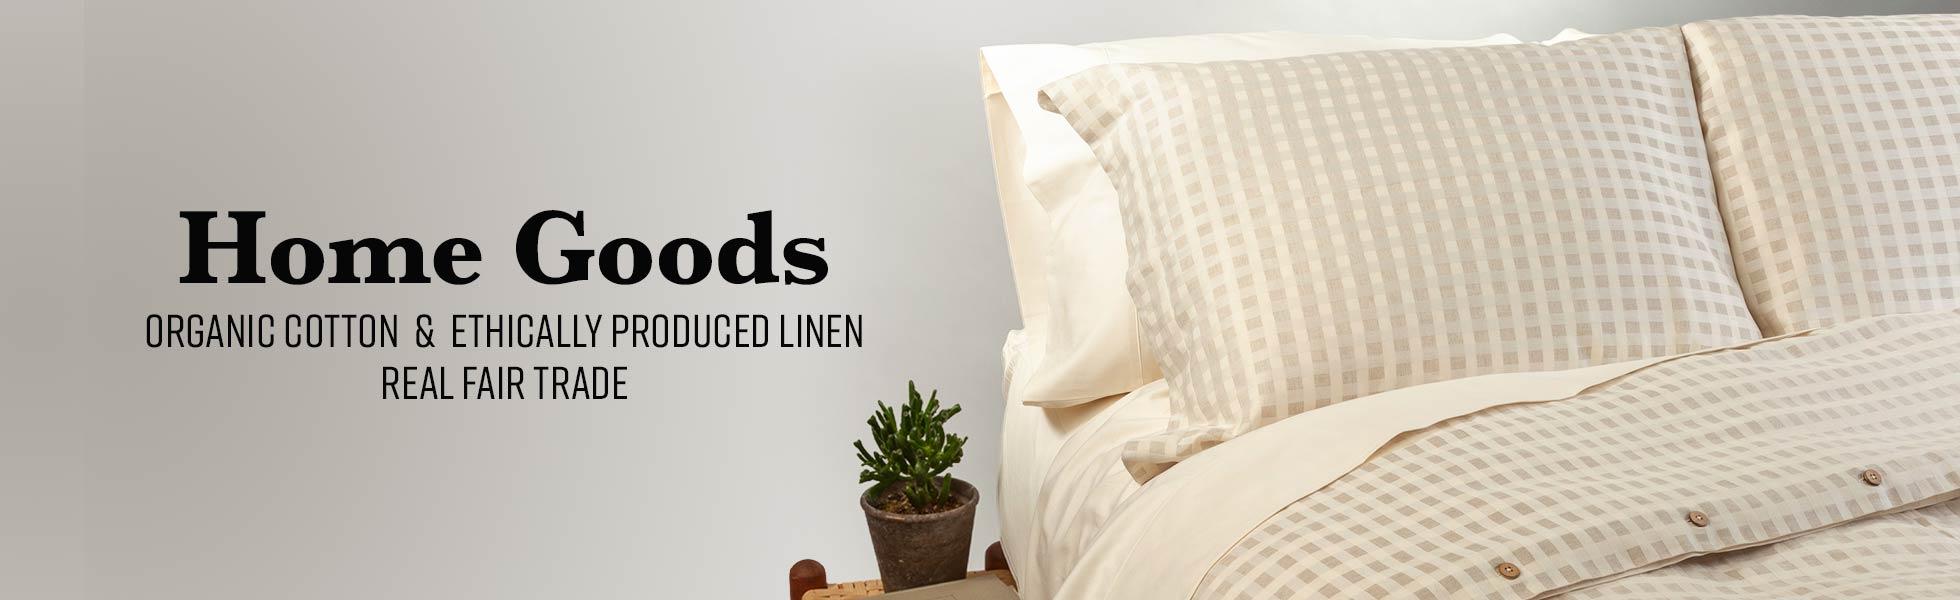 Organic Cotton Home Goods